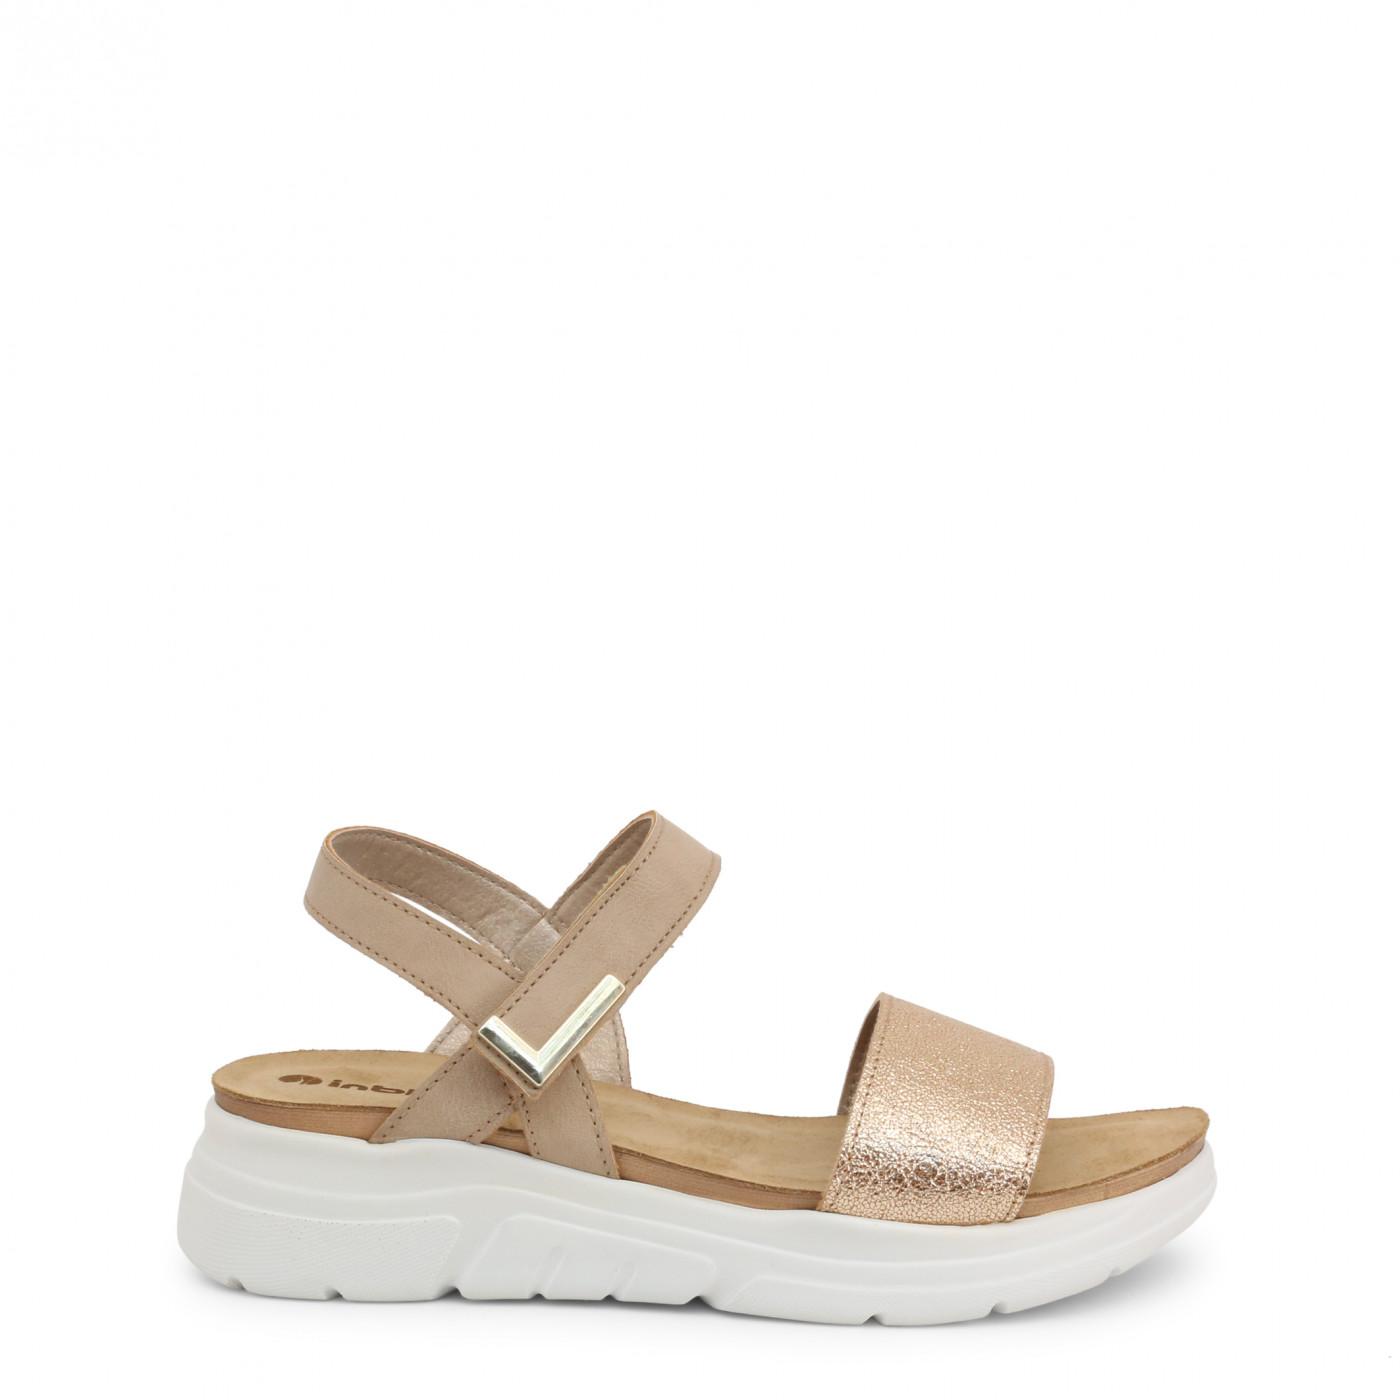 Women's sandals  Inblu Detailed